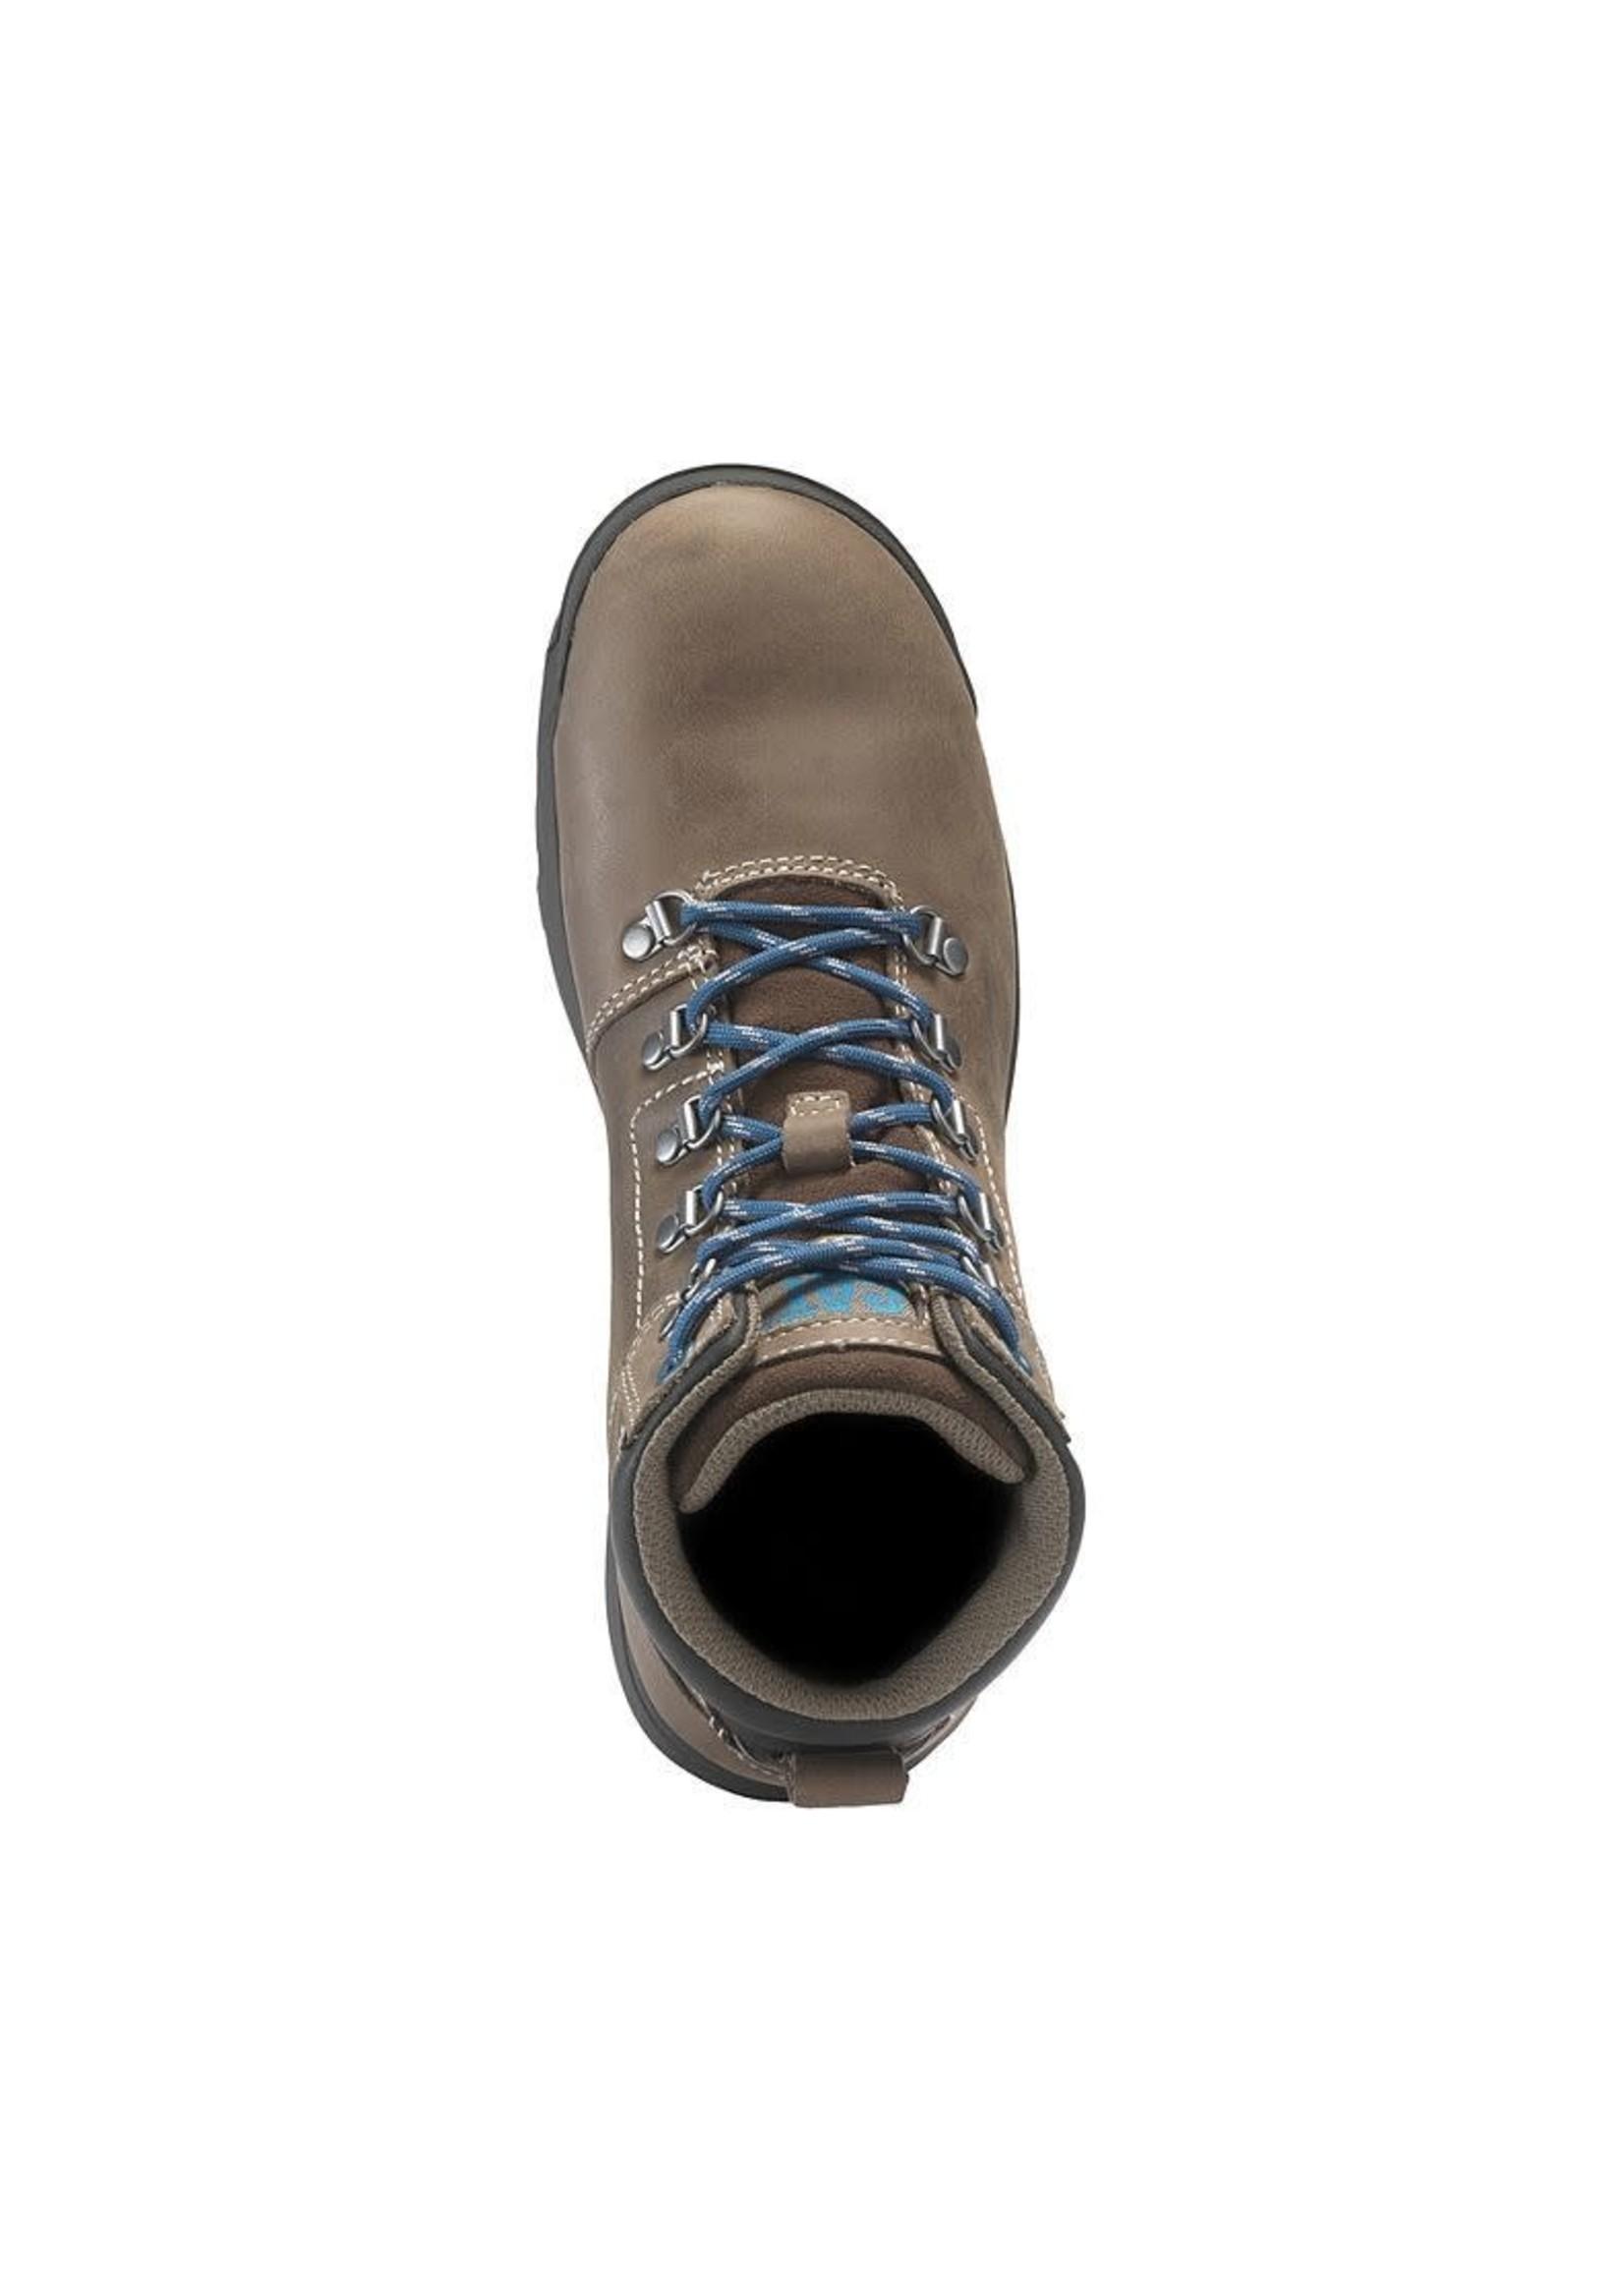 Caterpillar Women 's Mae Steel Toe Waterproof Work Boot P91012